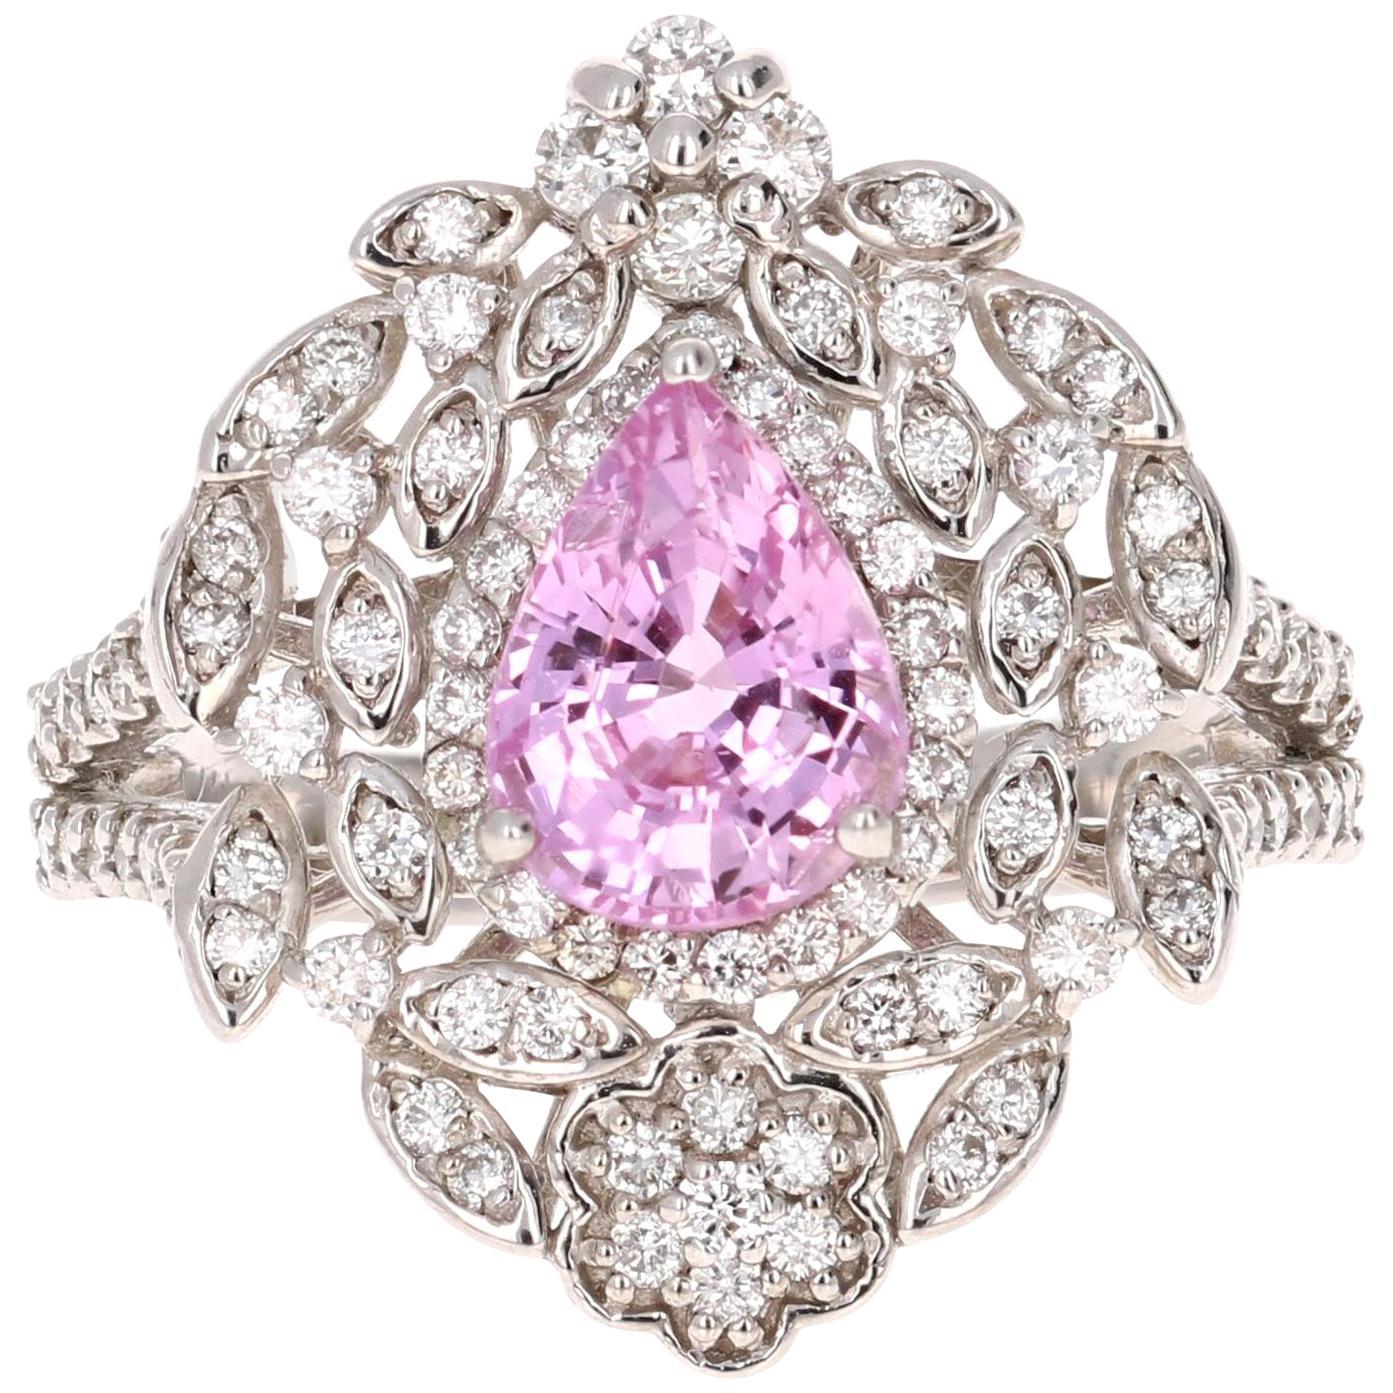 2.75 Carat Pink Sapphire Diamond White Gold Cocktail Ring